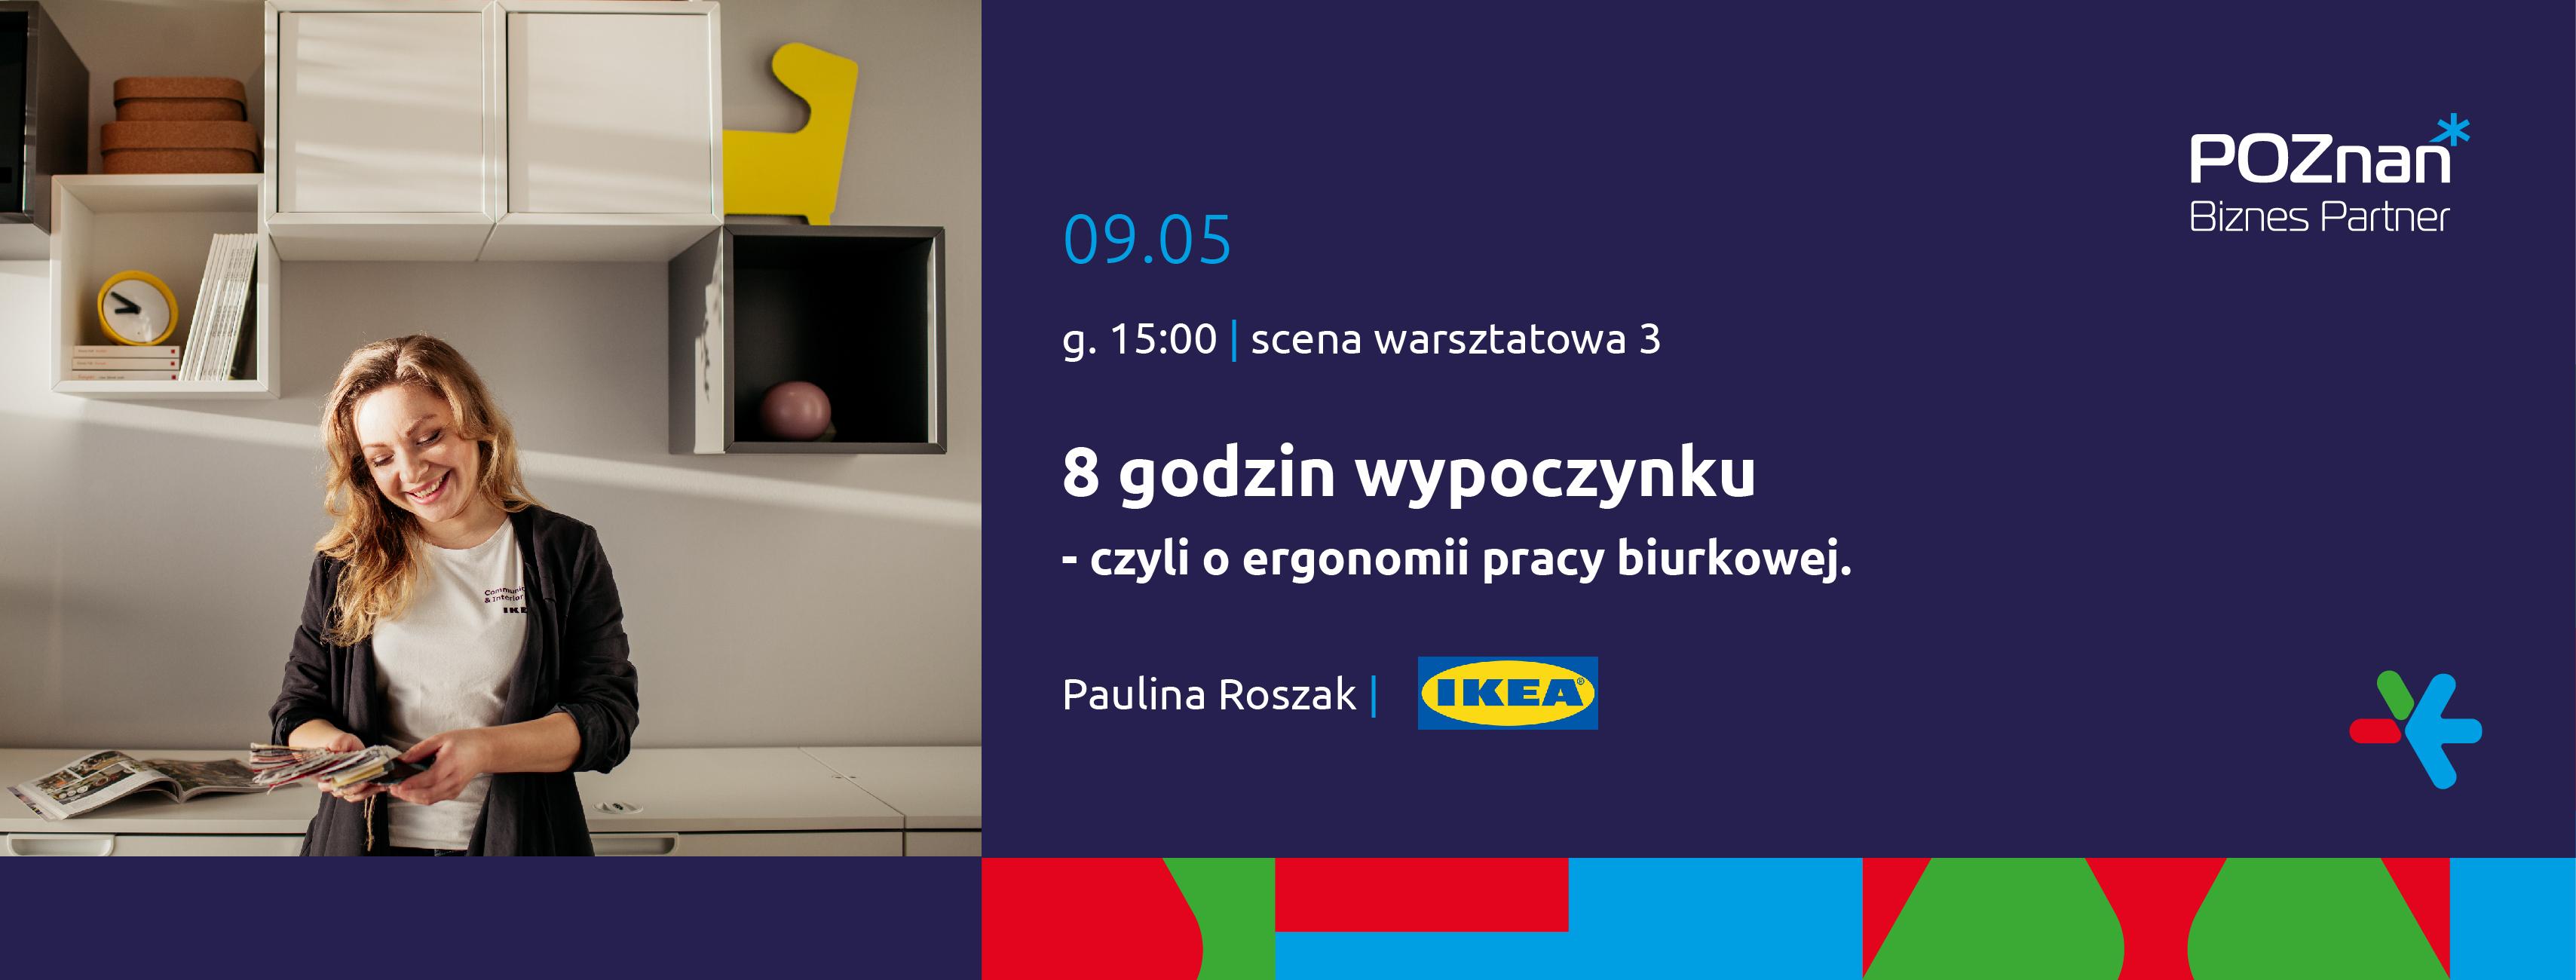 Poznań Biznes Partner 2019